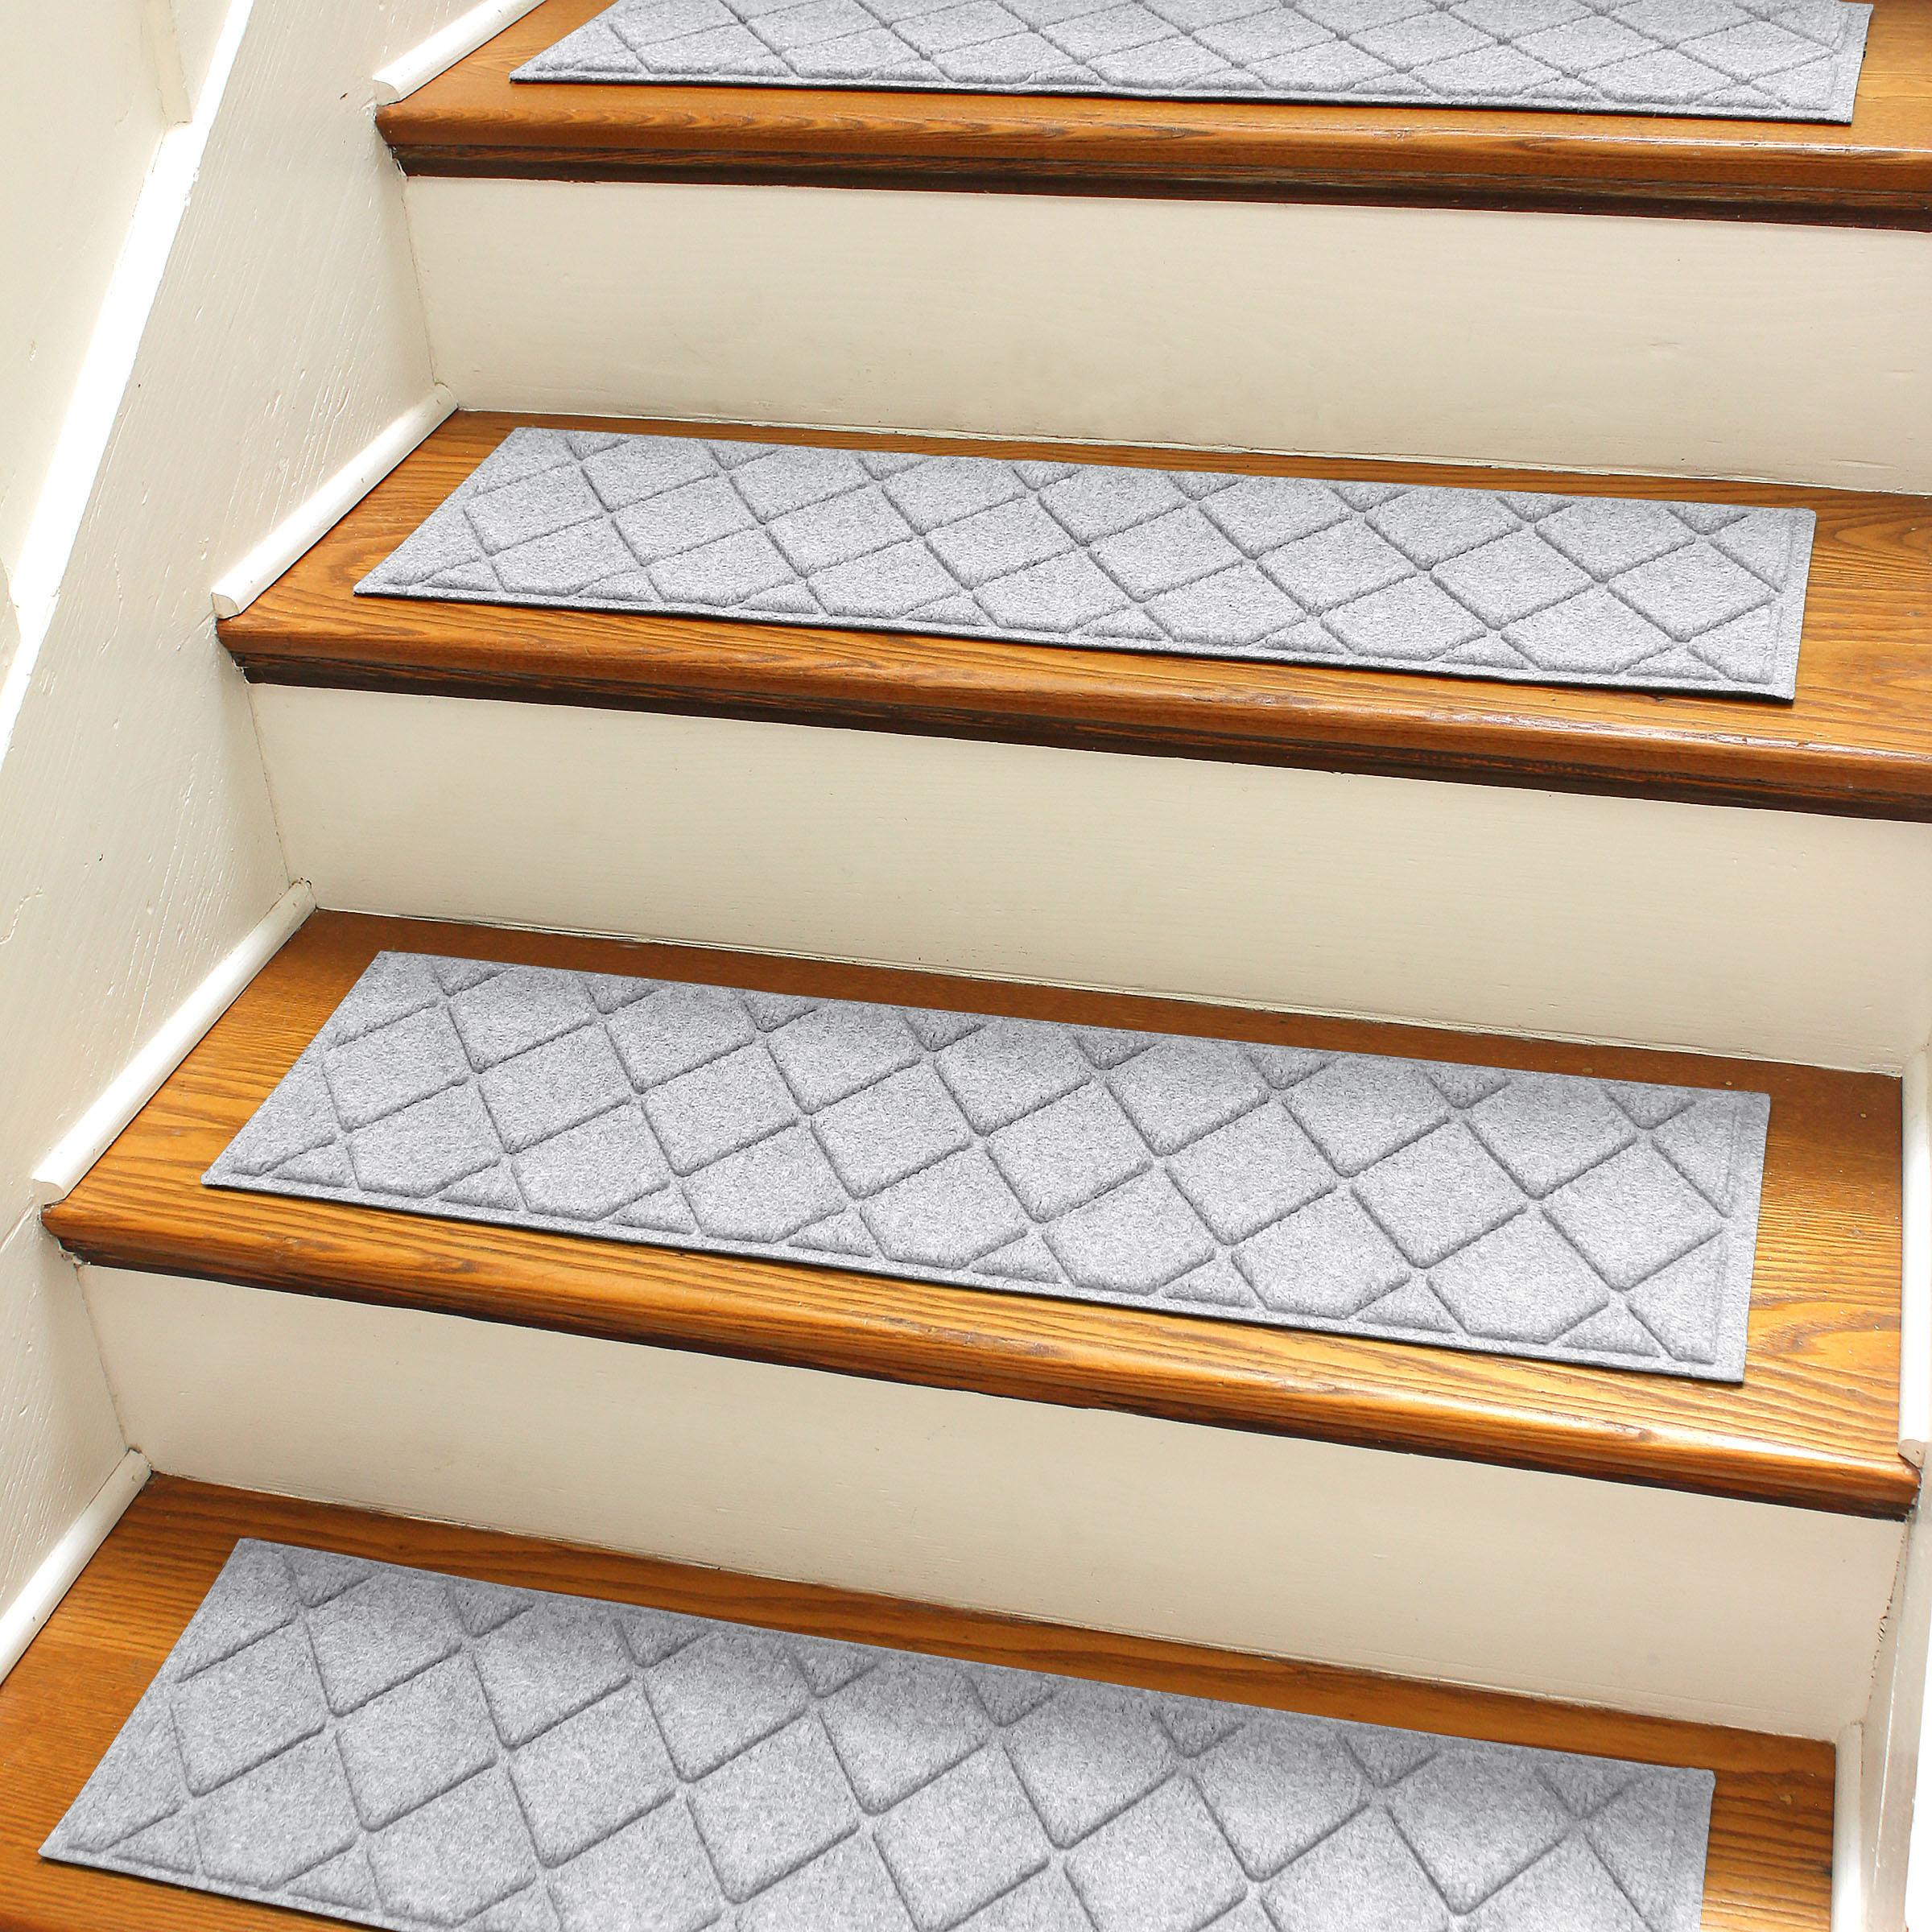 Stair Tread Set Via Wayfair